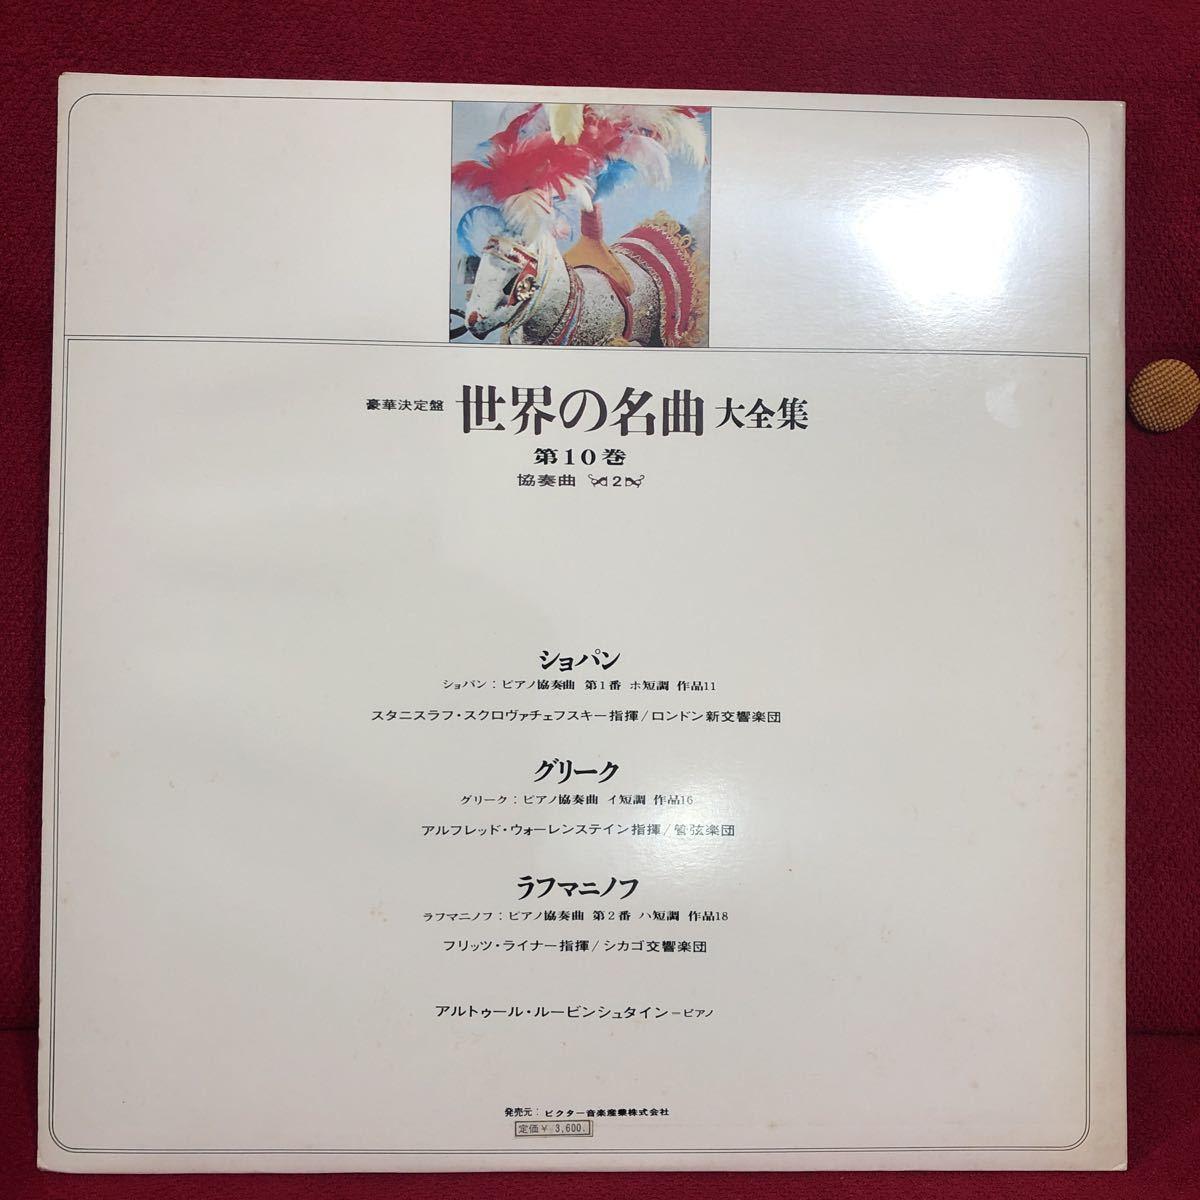 LPレコード★クラシックピアノ★豪華決定盤・世界の名曲大全集・第10巻★ショパン・グリーク・ラフマニノフ  2枚組_画像9